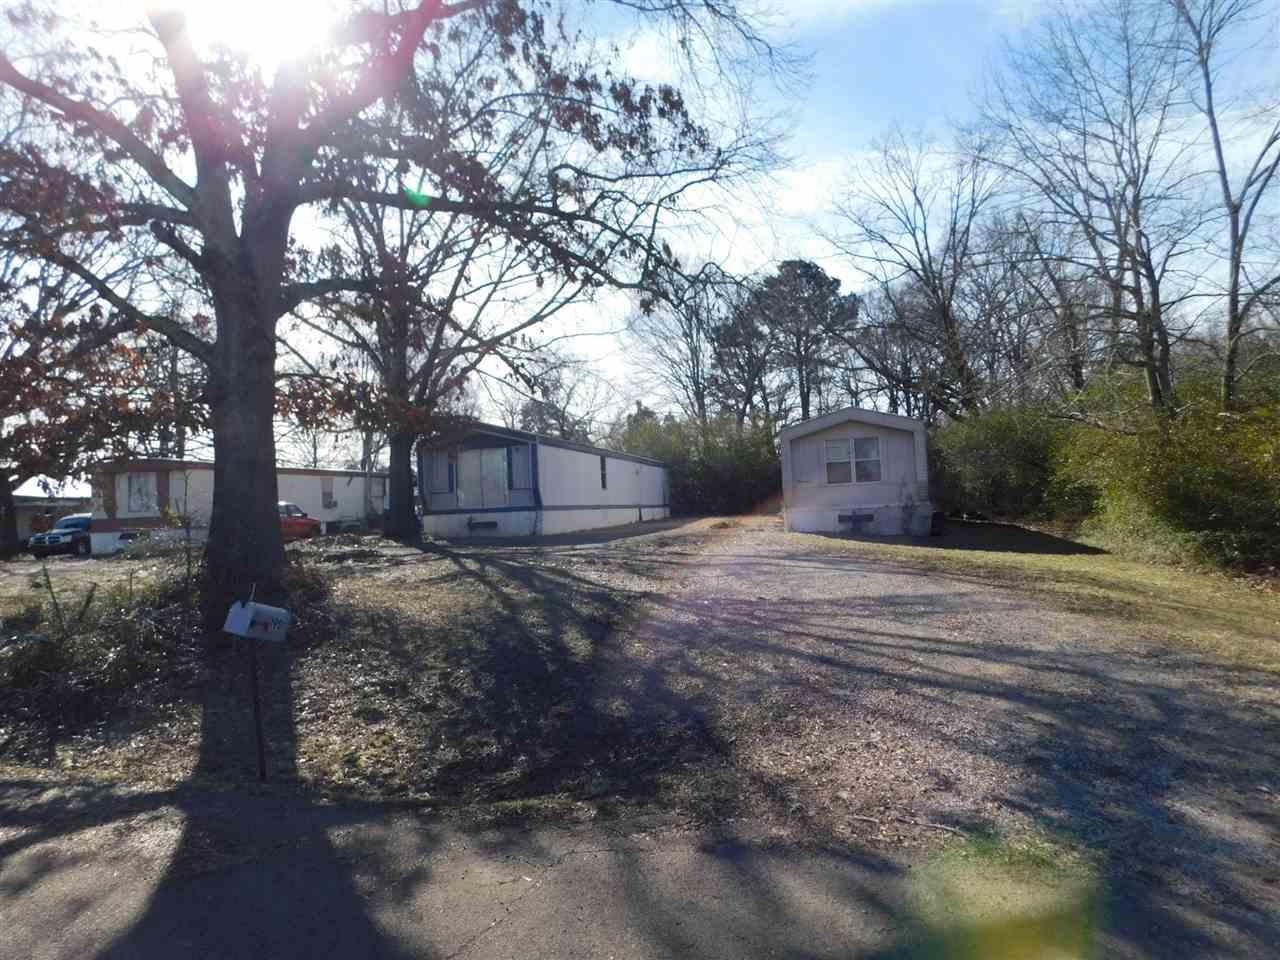 1 High Savannah, TN 38372 - MLS #: 10019940